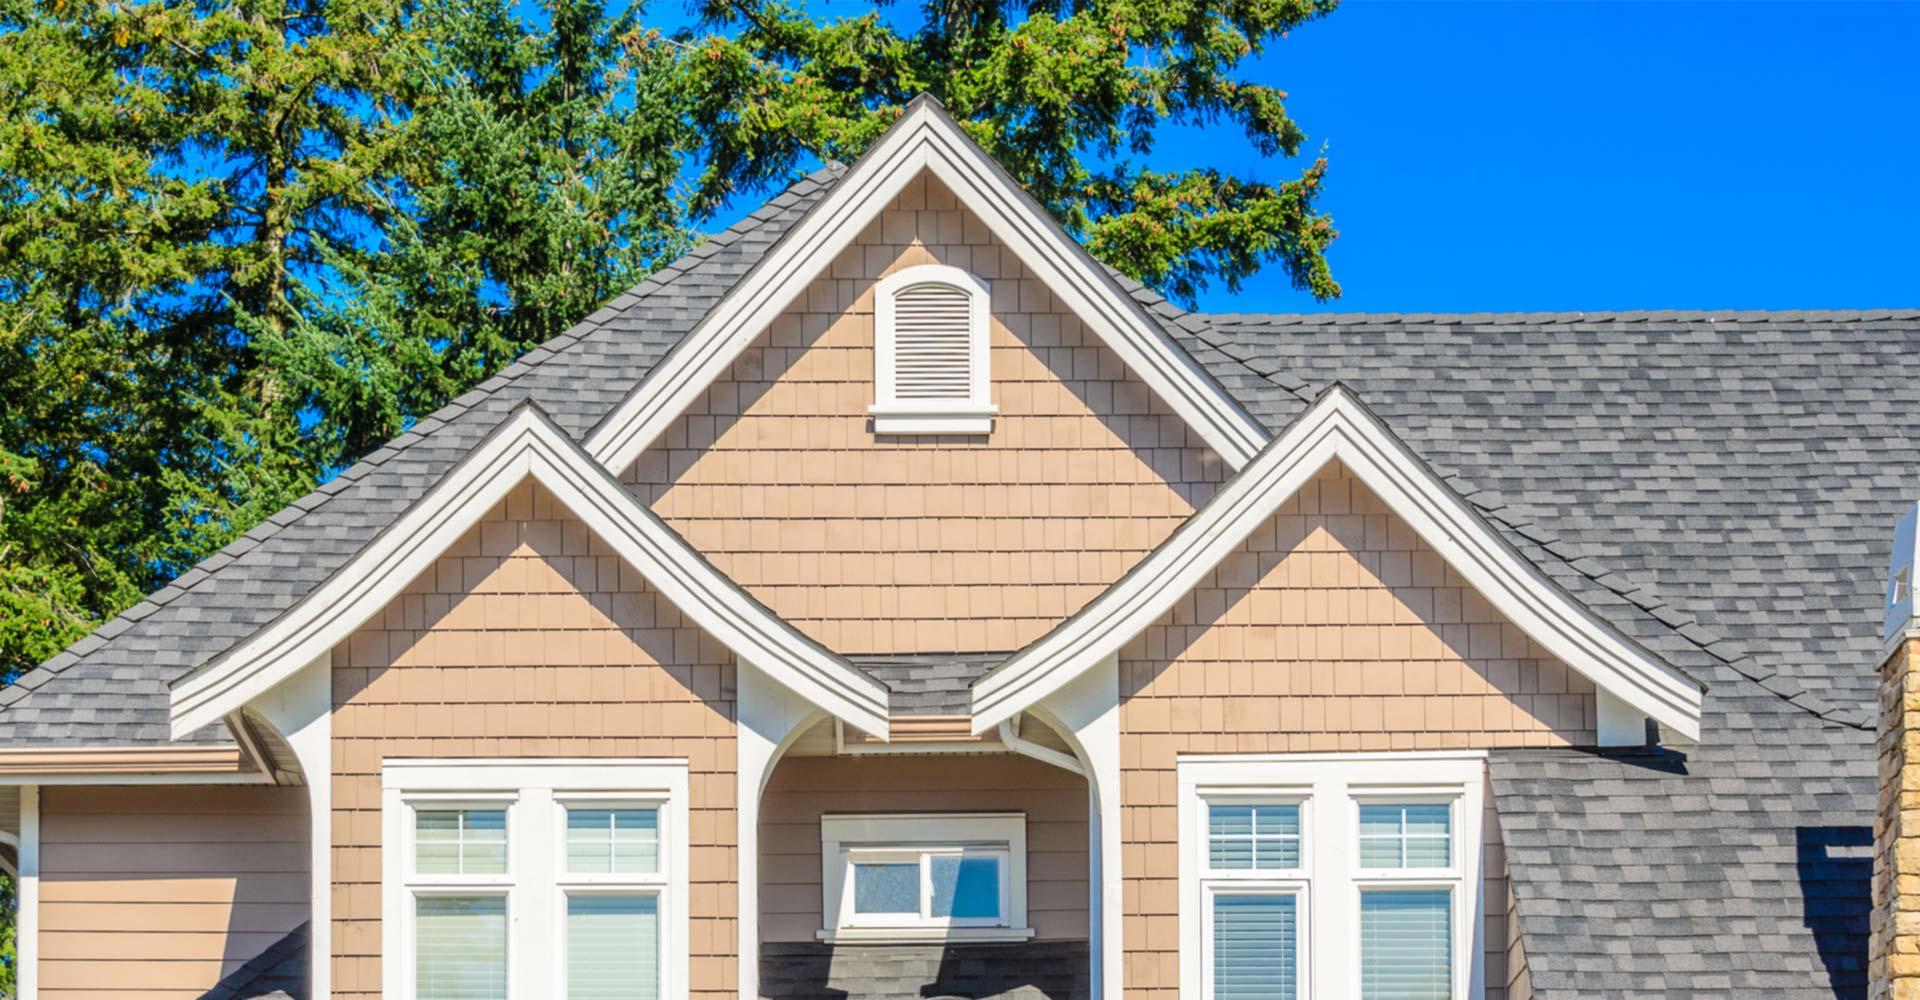 Roofer Greenville SC - Davis Contracting